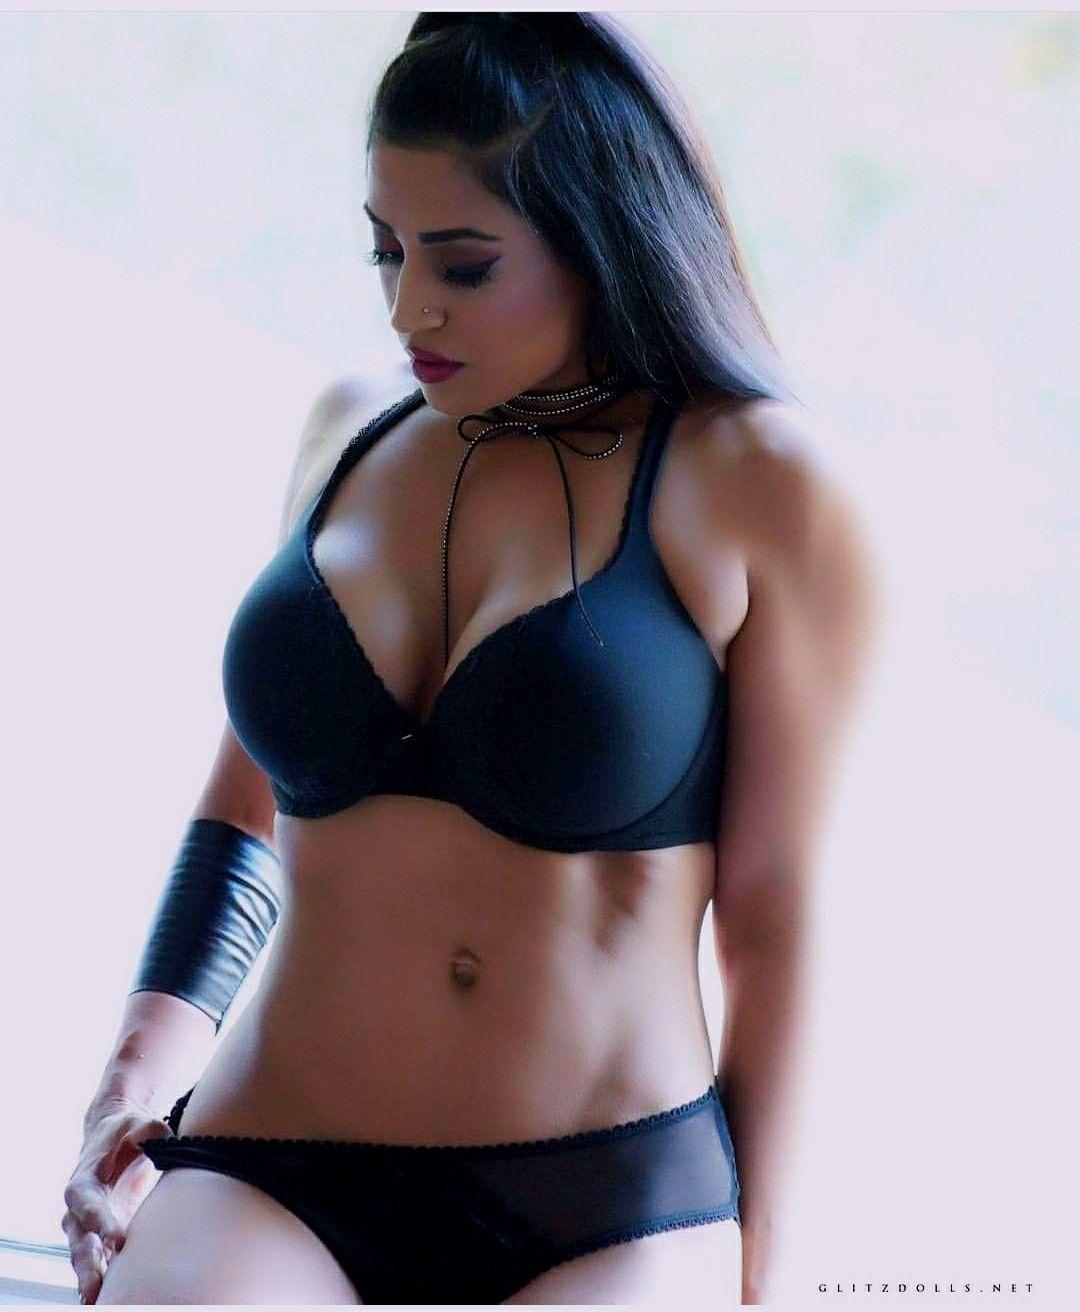 e78810951b3fc Western Outfits, Bikini Bod, Black Bikini, Hottest Pic, Indian Beauty,  Bikinis